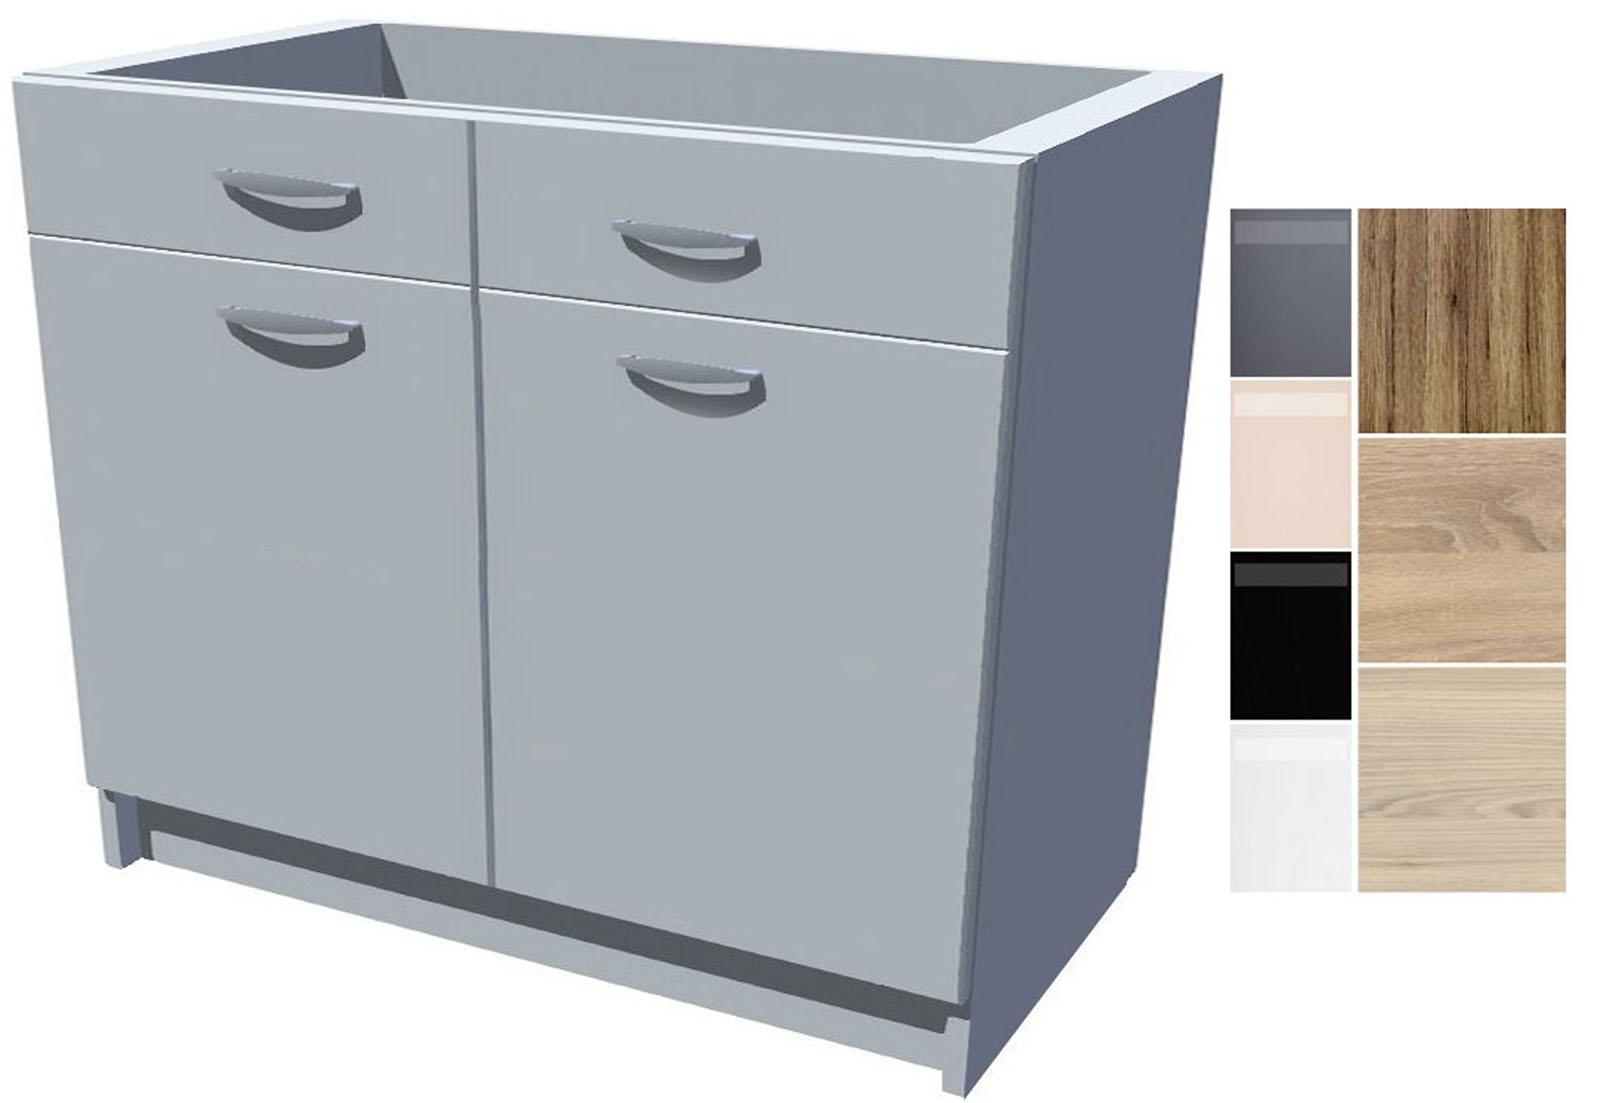 Dřezová kuchyňská skříňka Iga 2D 100 cm